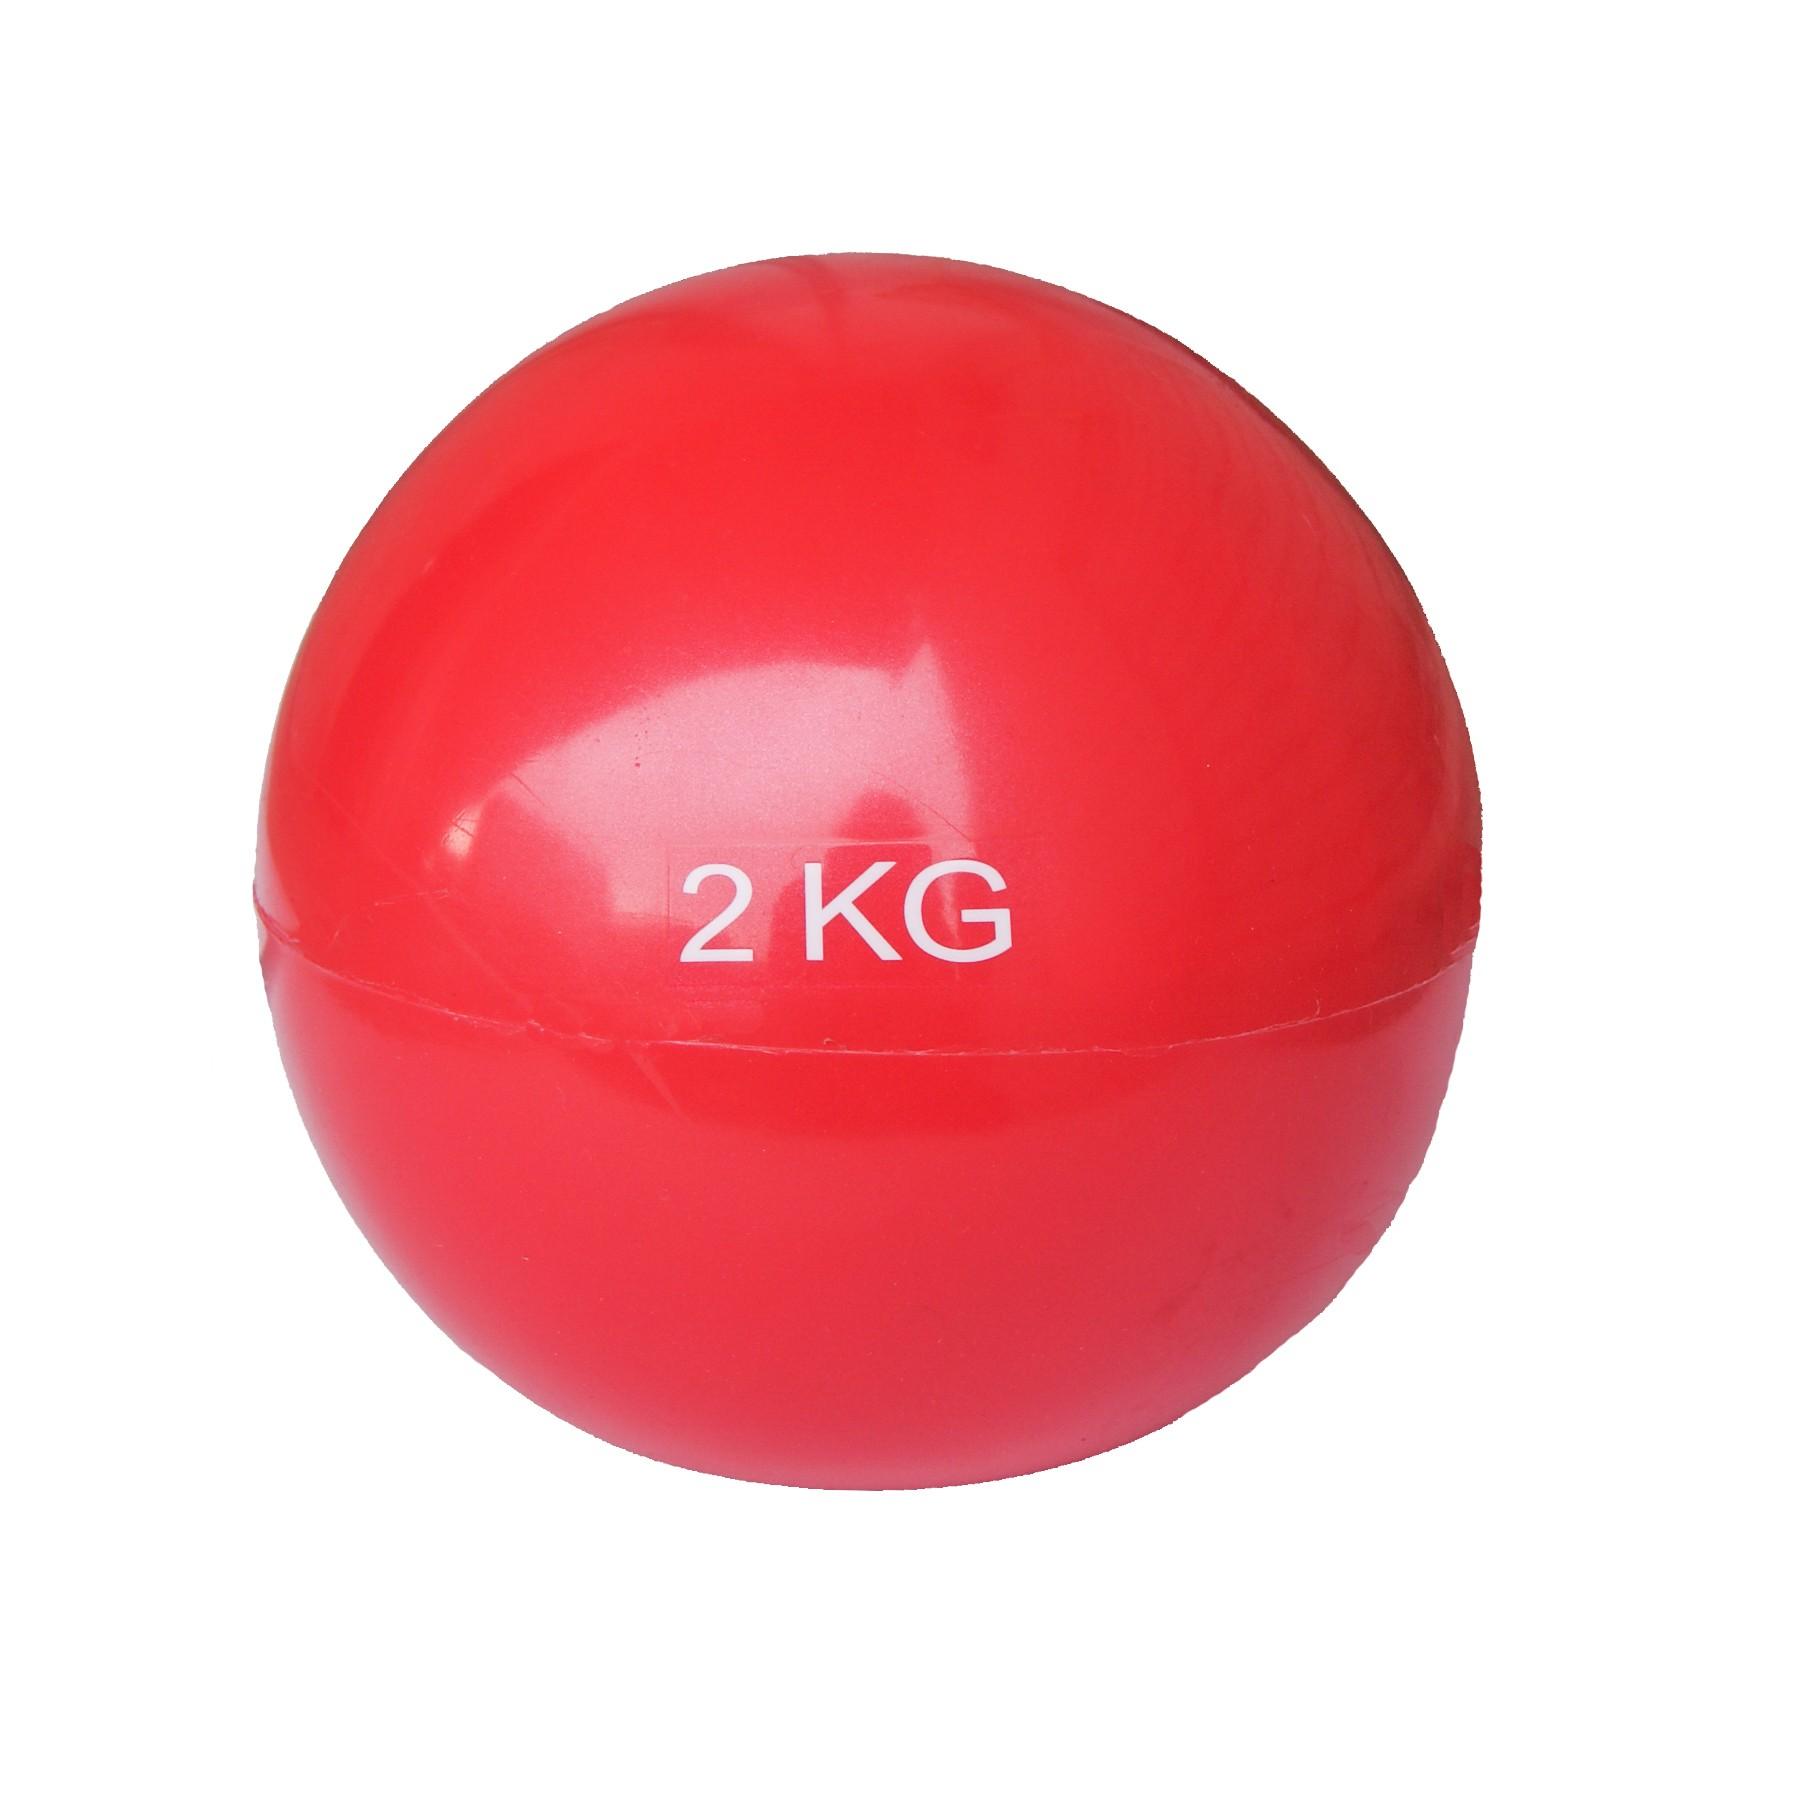 Minge yoga, rosu, 2 kg